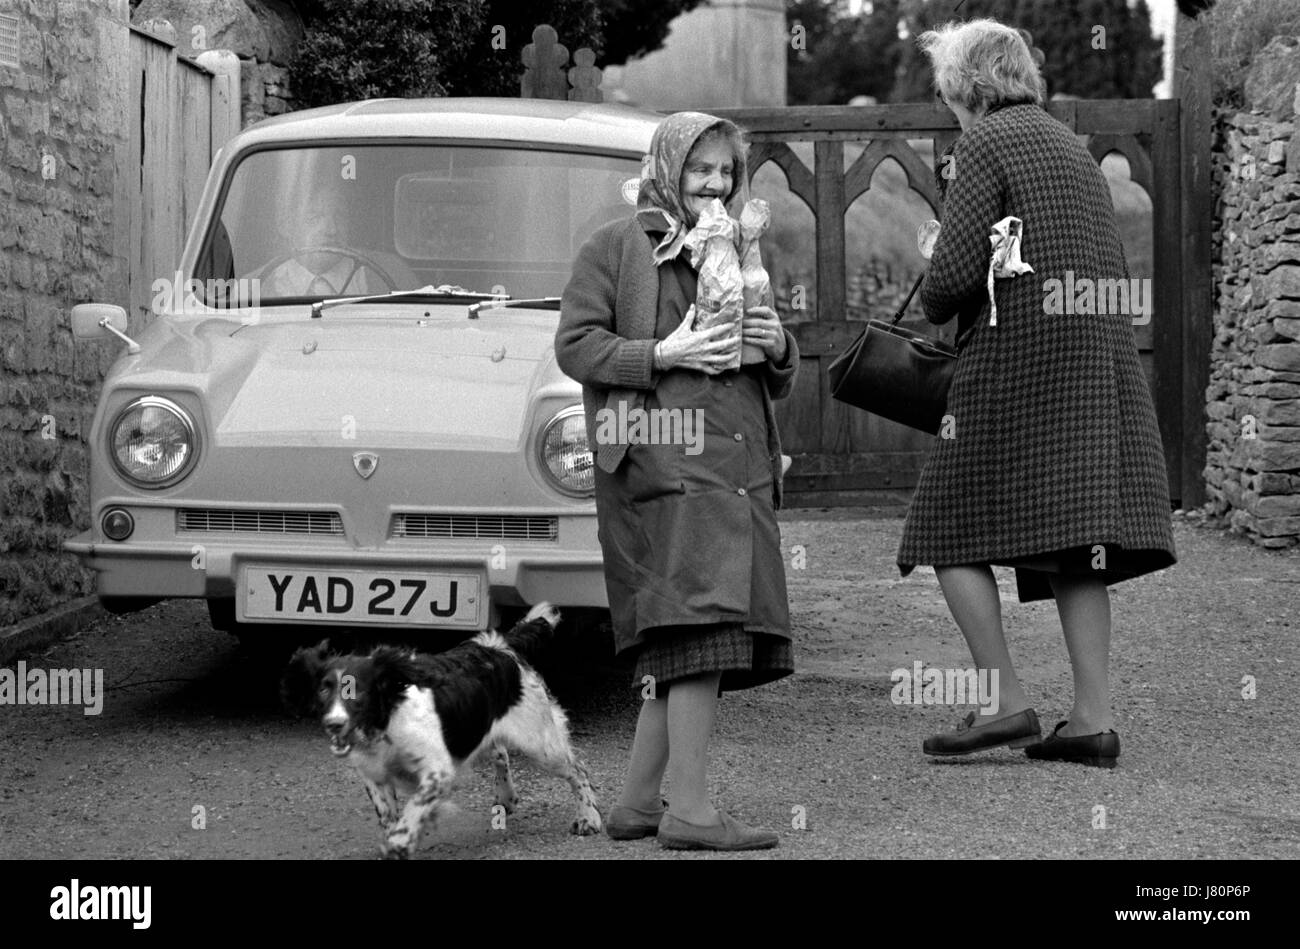 1970s village life England Uk countryside Upper Slaughter Elderly women in the village HOMER SYKES - Stock Image